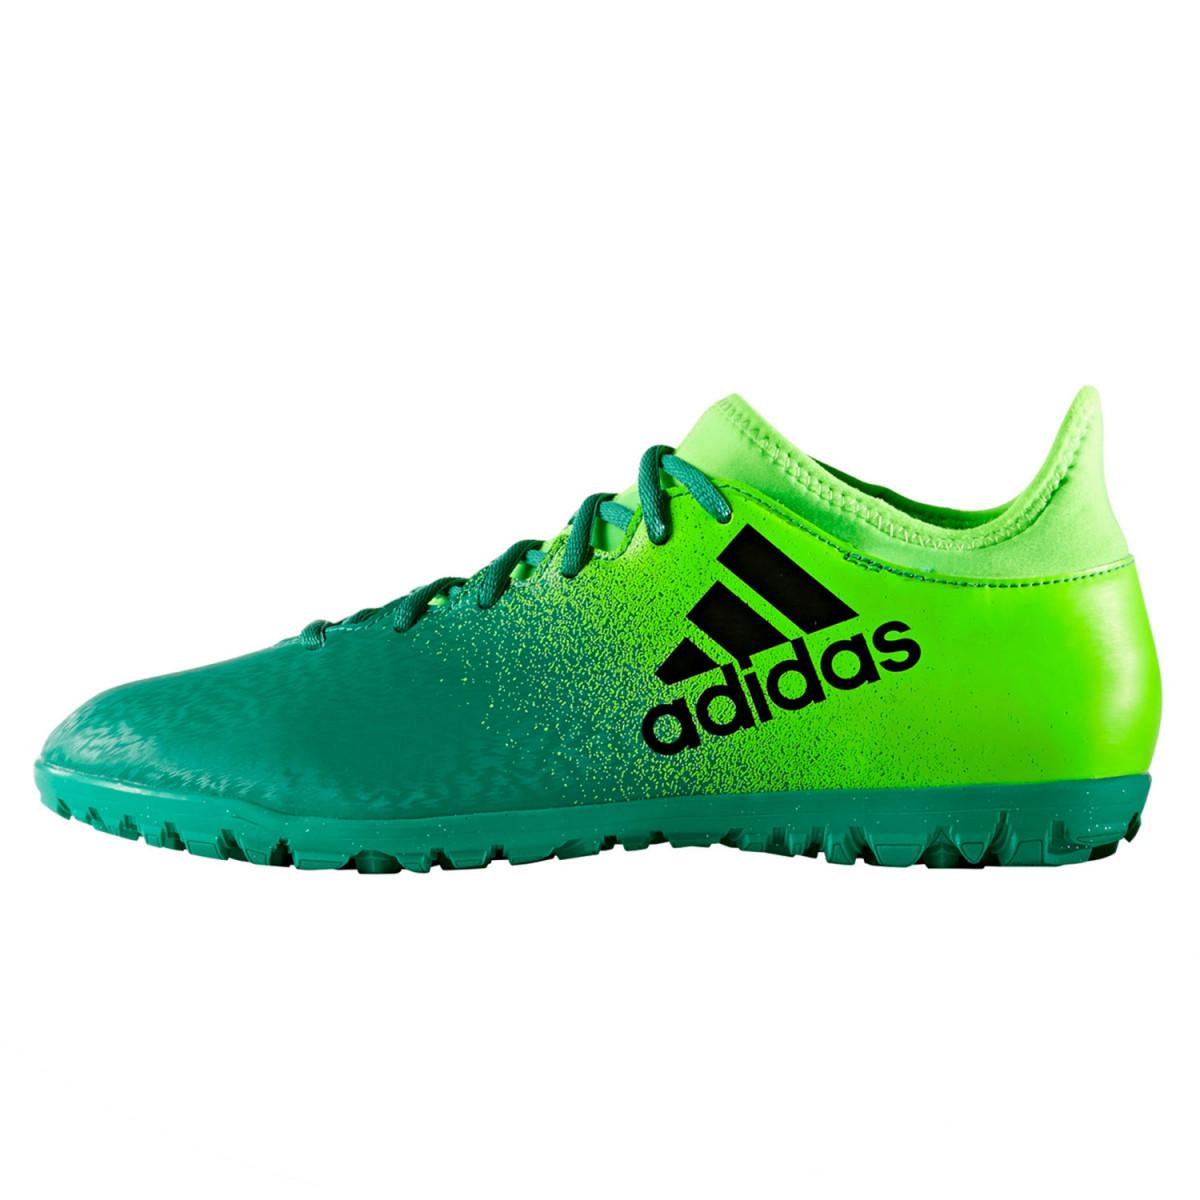 Botines Adidas X 16.3 Tf